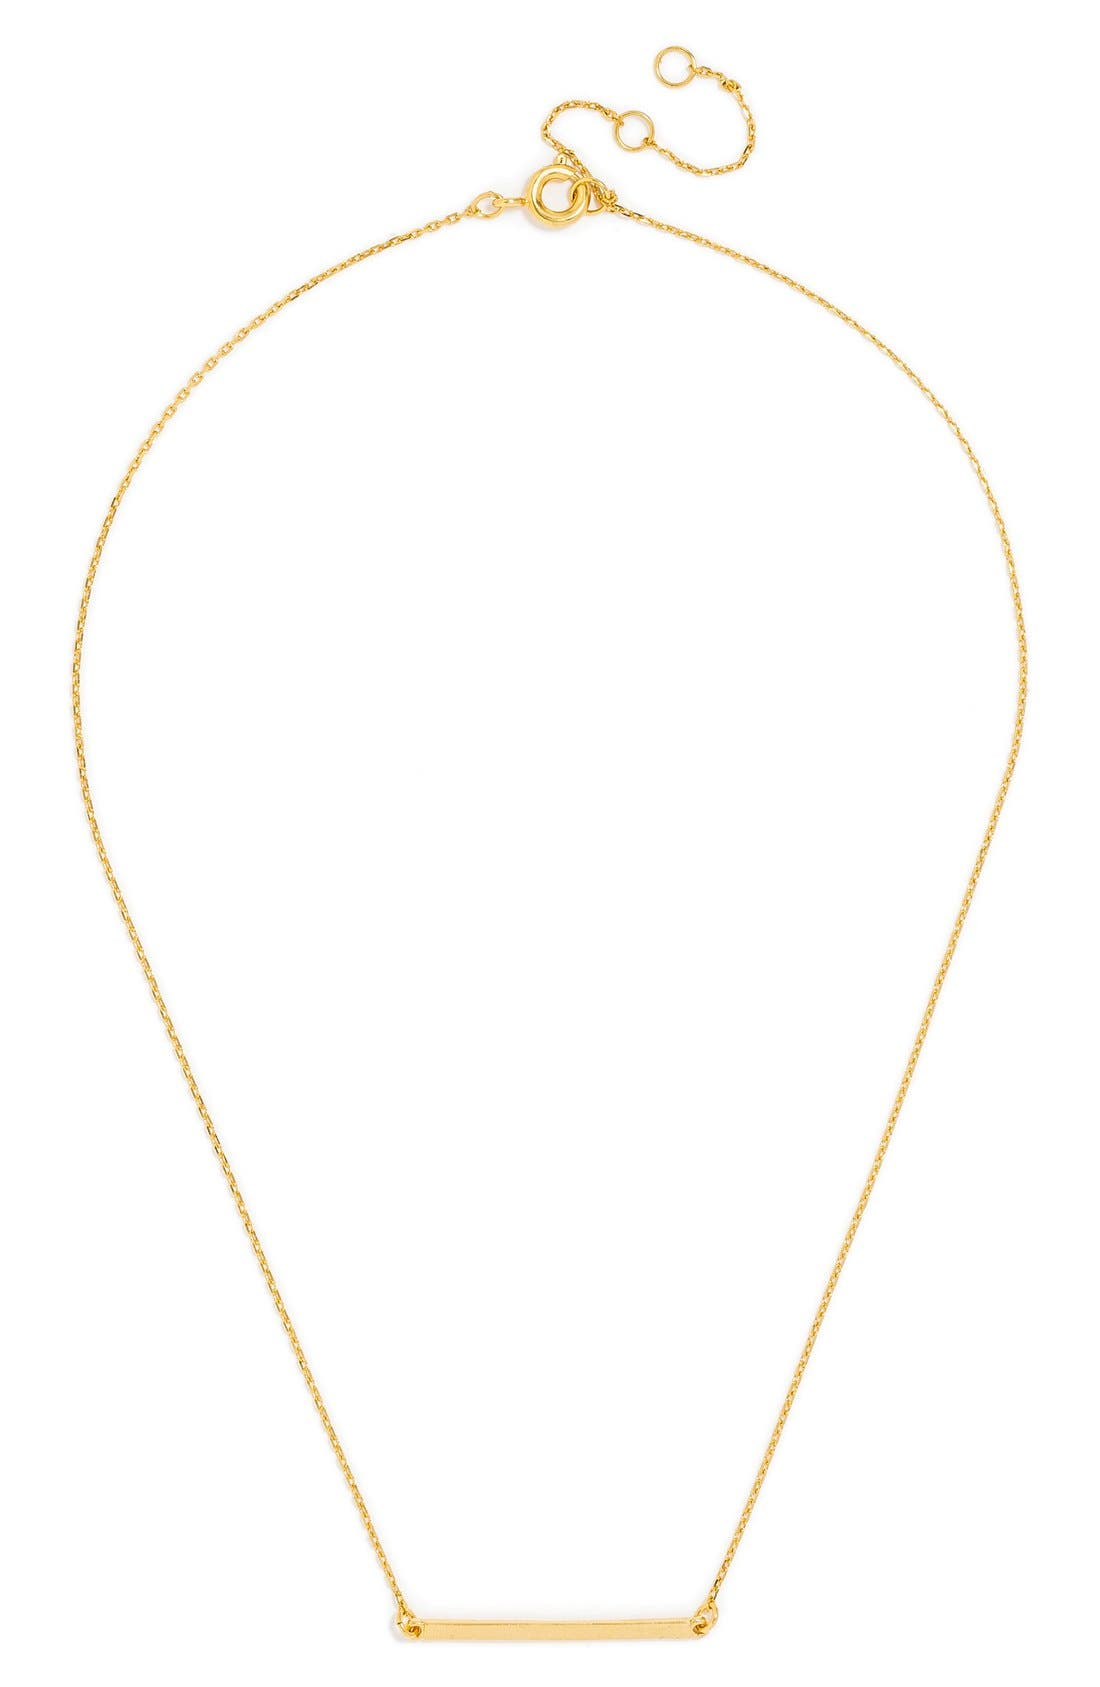 Main Image - BaubleBar Solid Bar Pendant Necklace